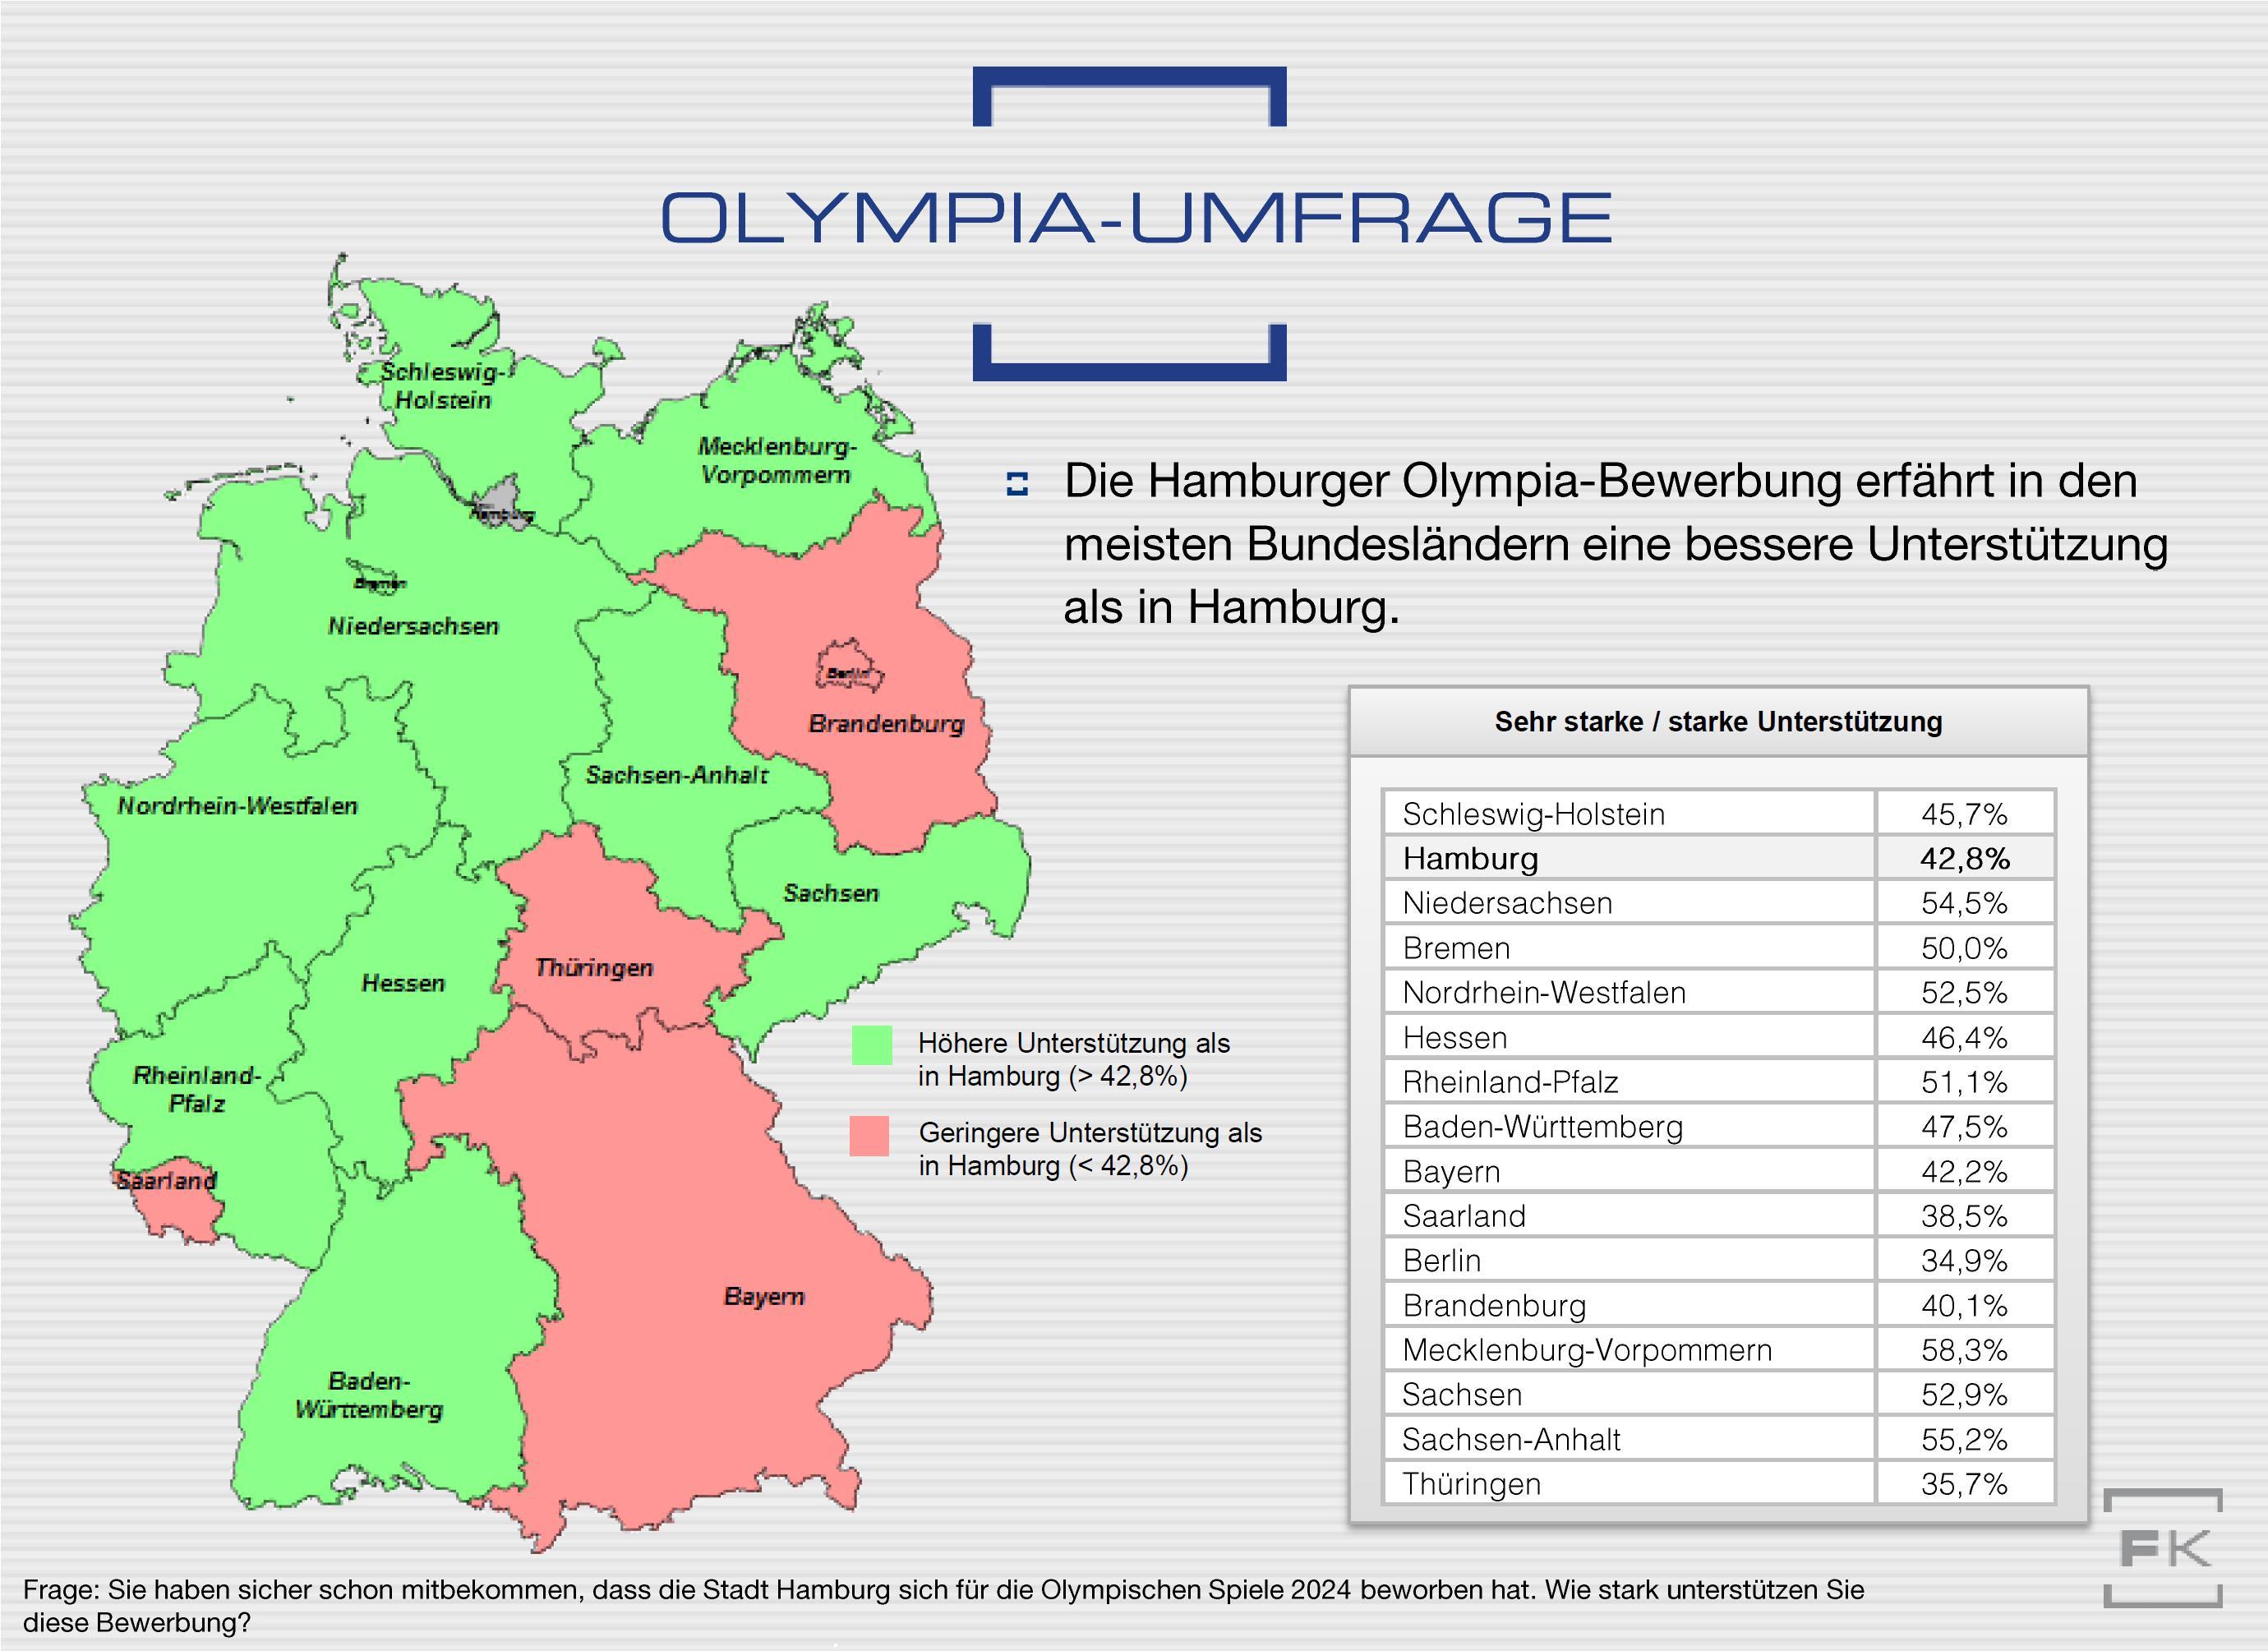 Grafik Olympia-Unterstützung Bundesländer Faktenkontor